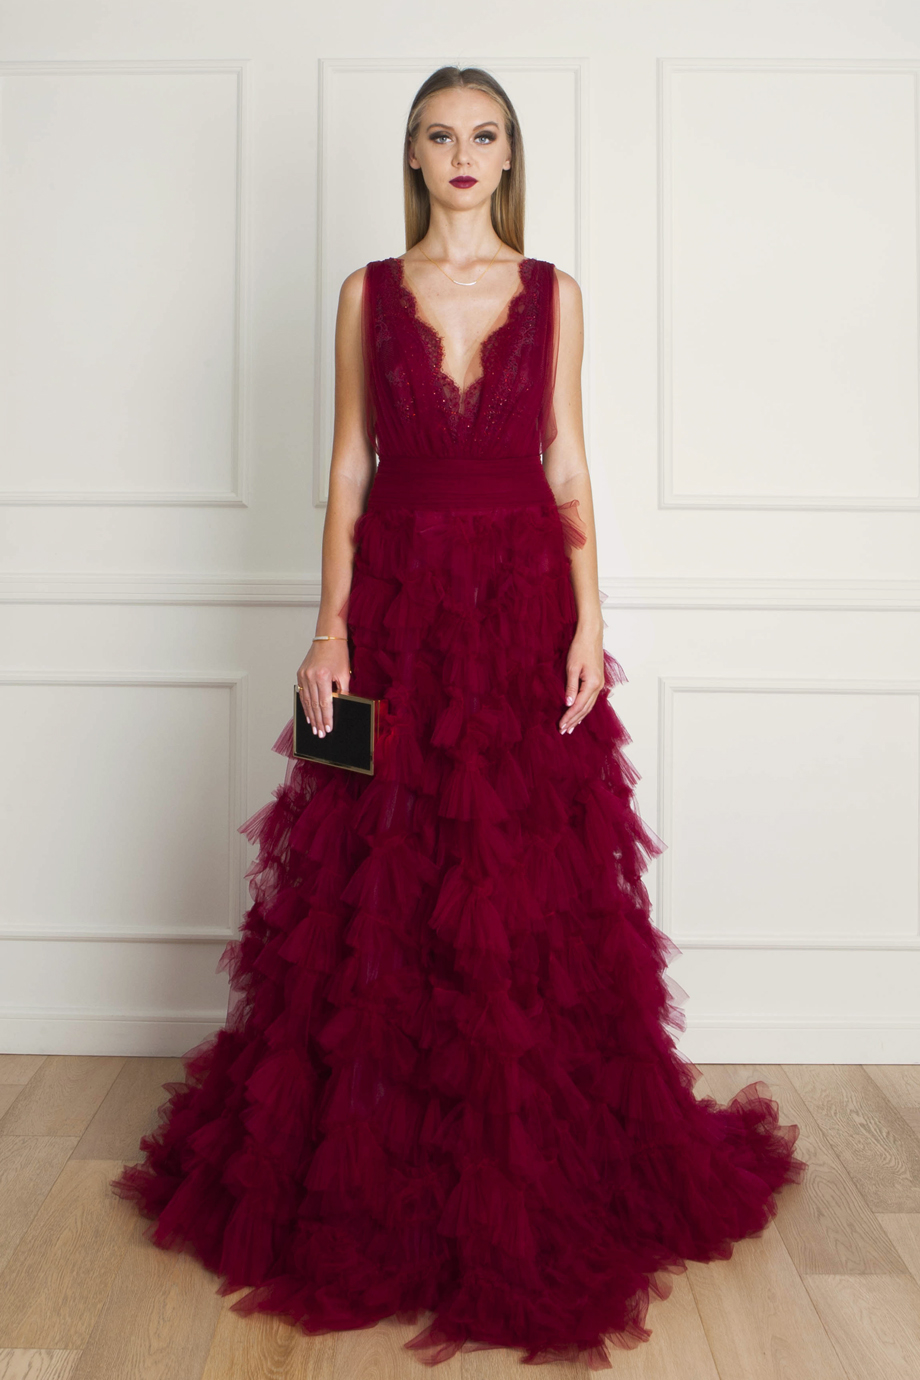 Marchesa Red Dresses_Other dresses_dressesss